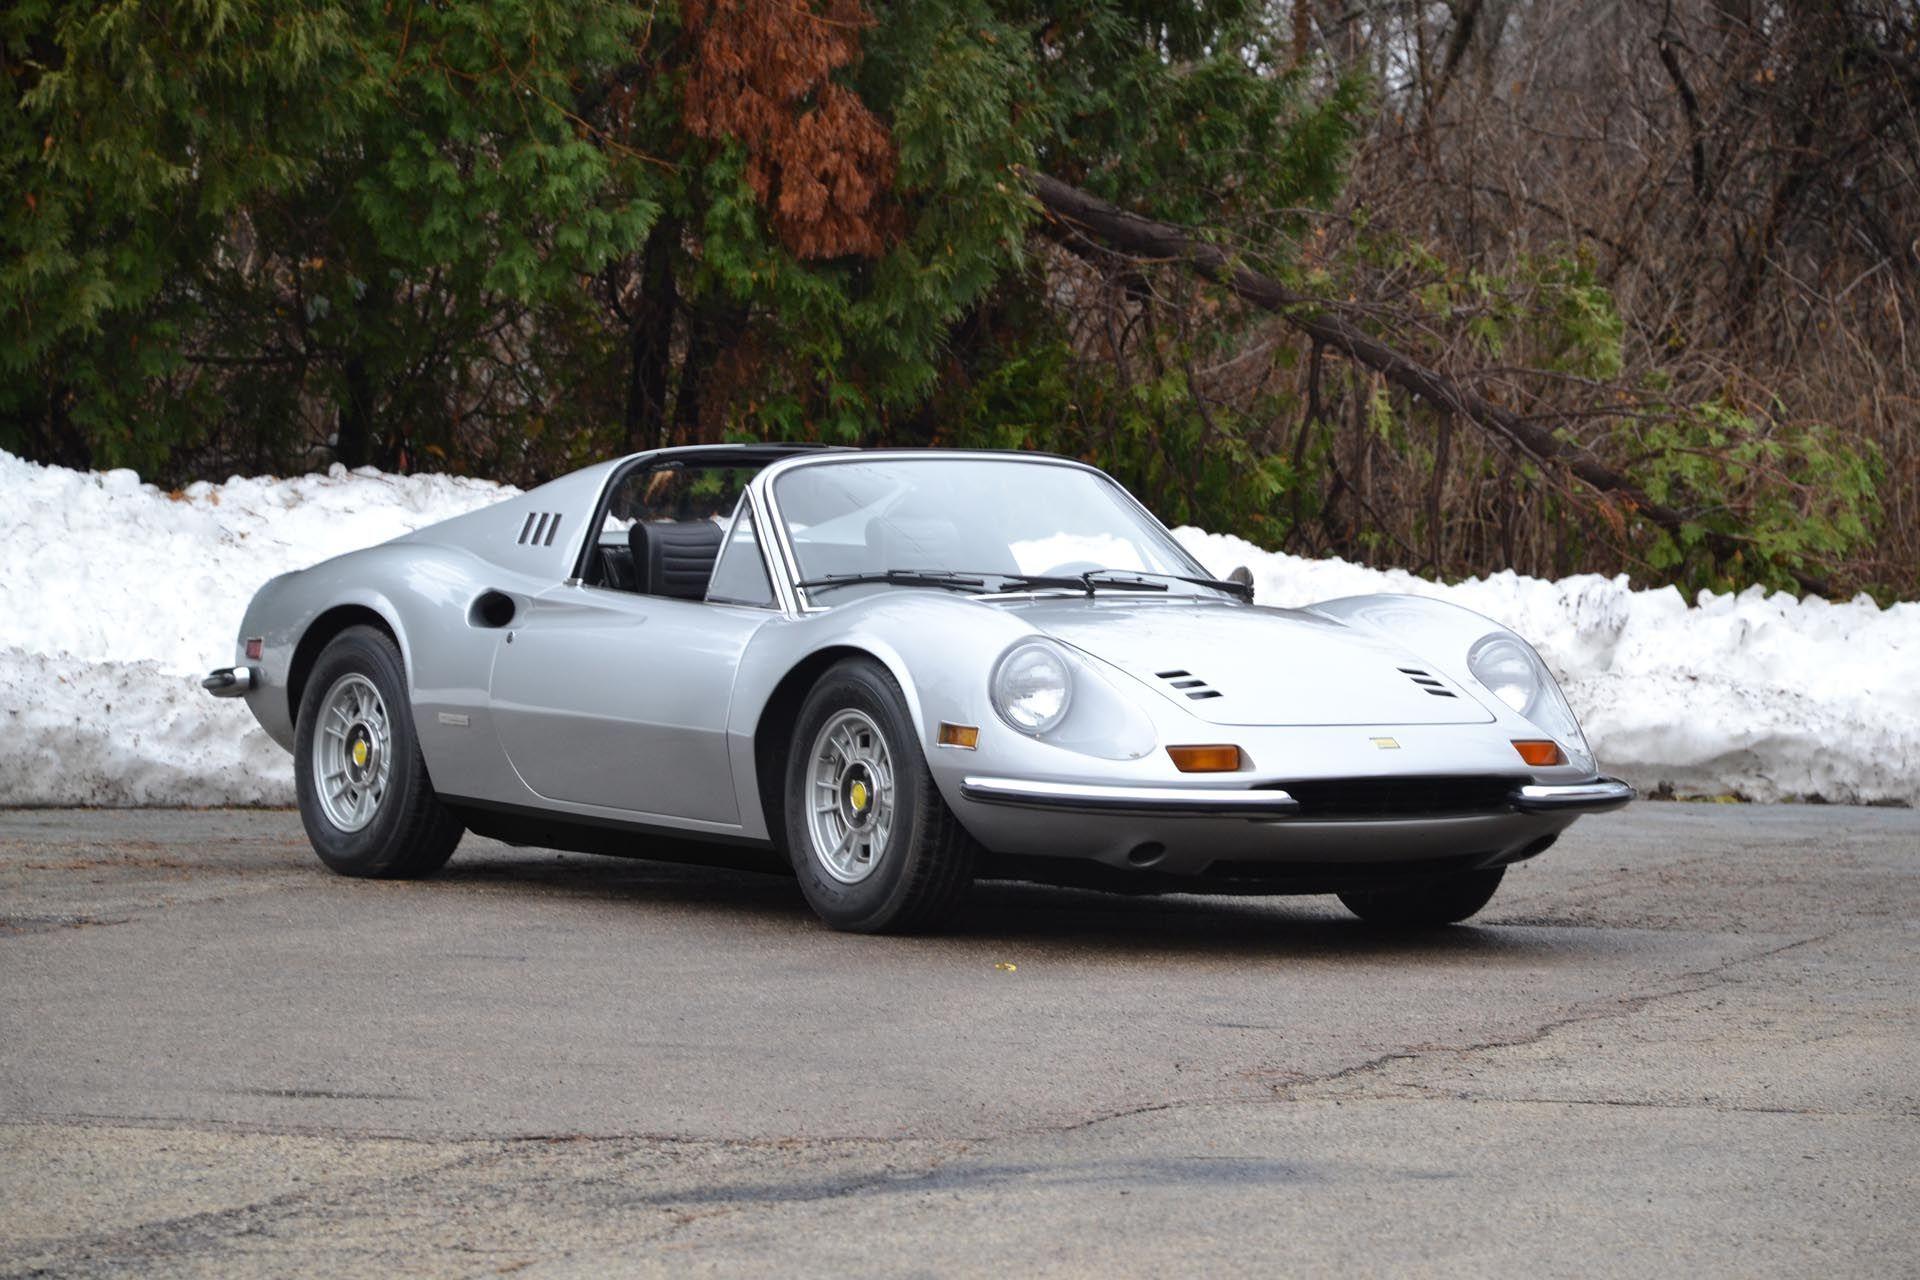 1973 Ferrari Dino 246 Gts Vin 06274 Classic Com